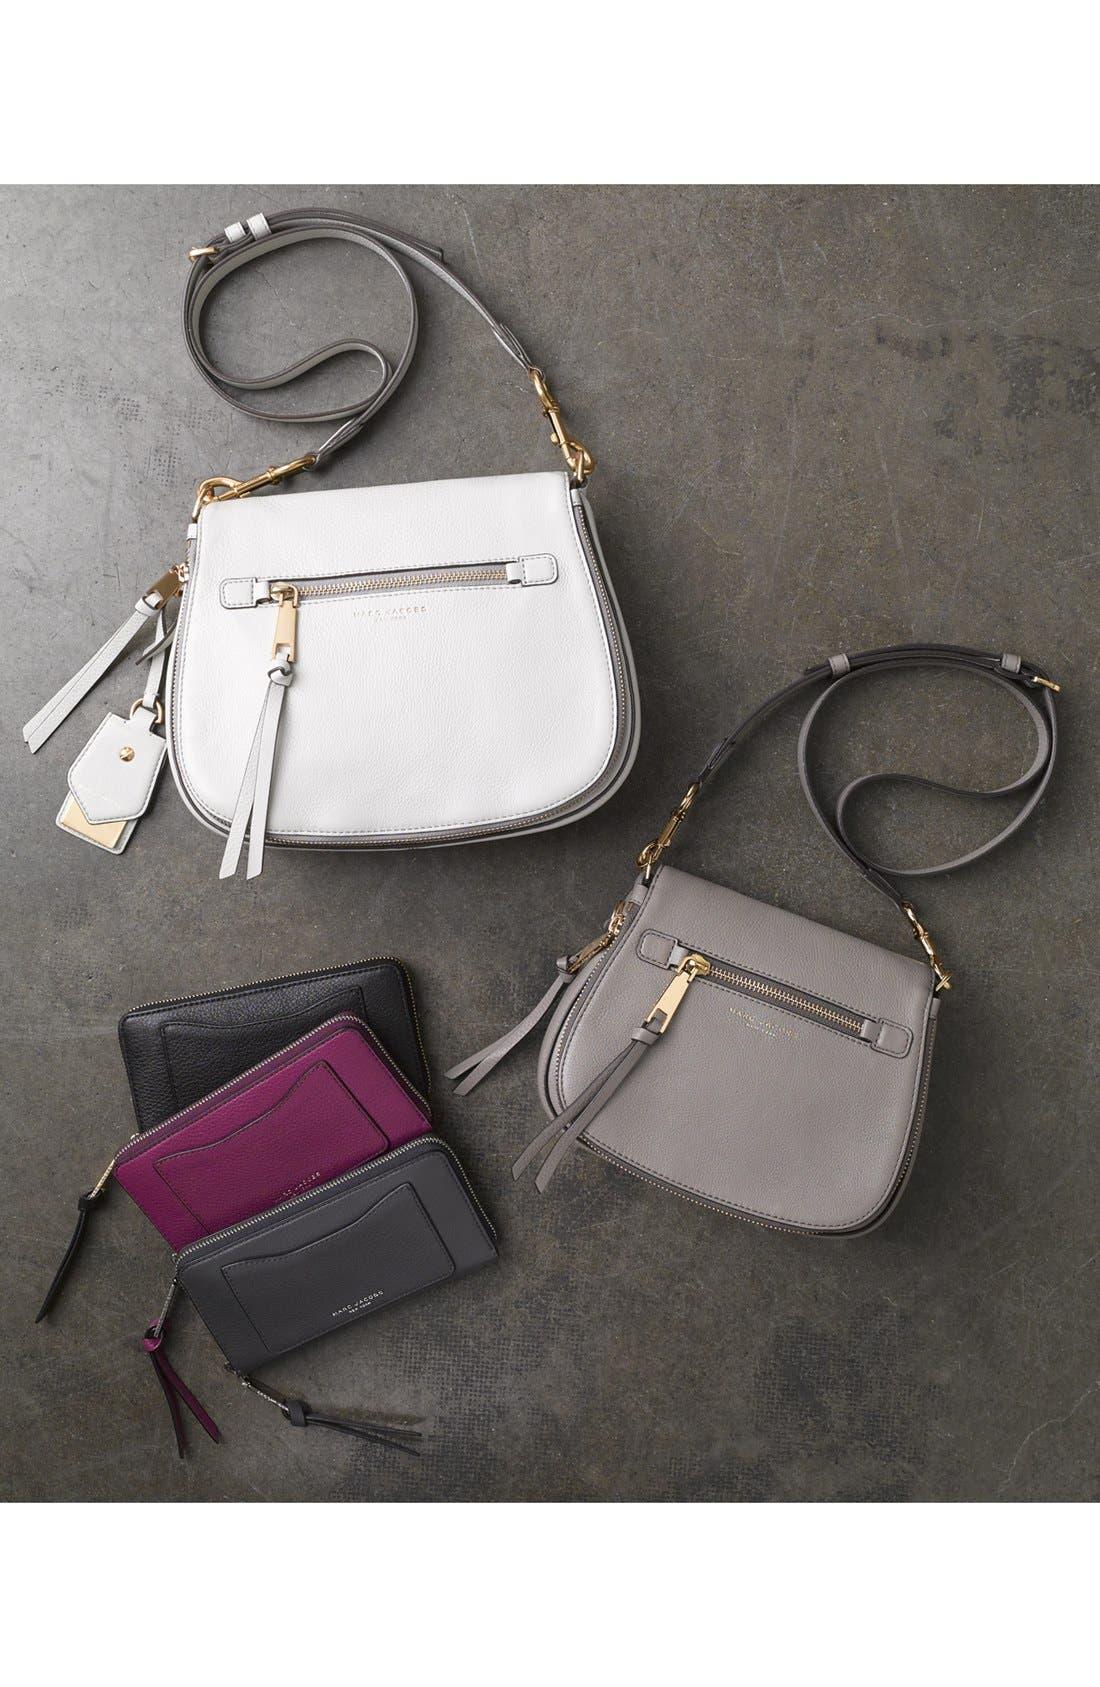 'Recruit Vertical' Leather Wallet,                             Alternate thumbnail 7, color,                             500